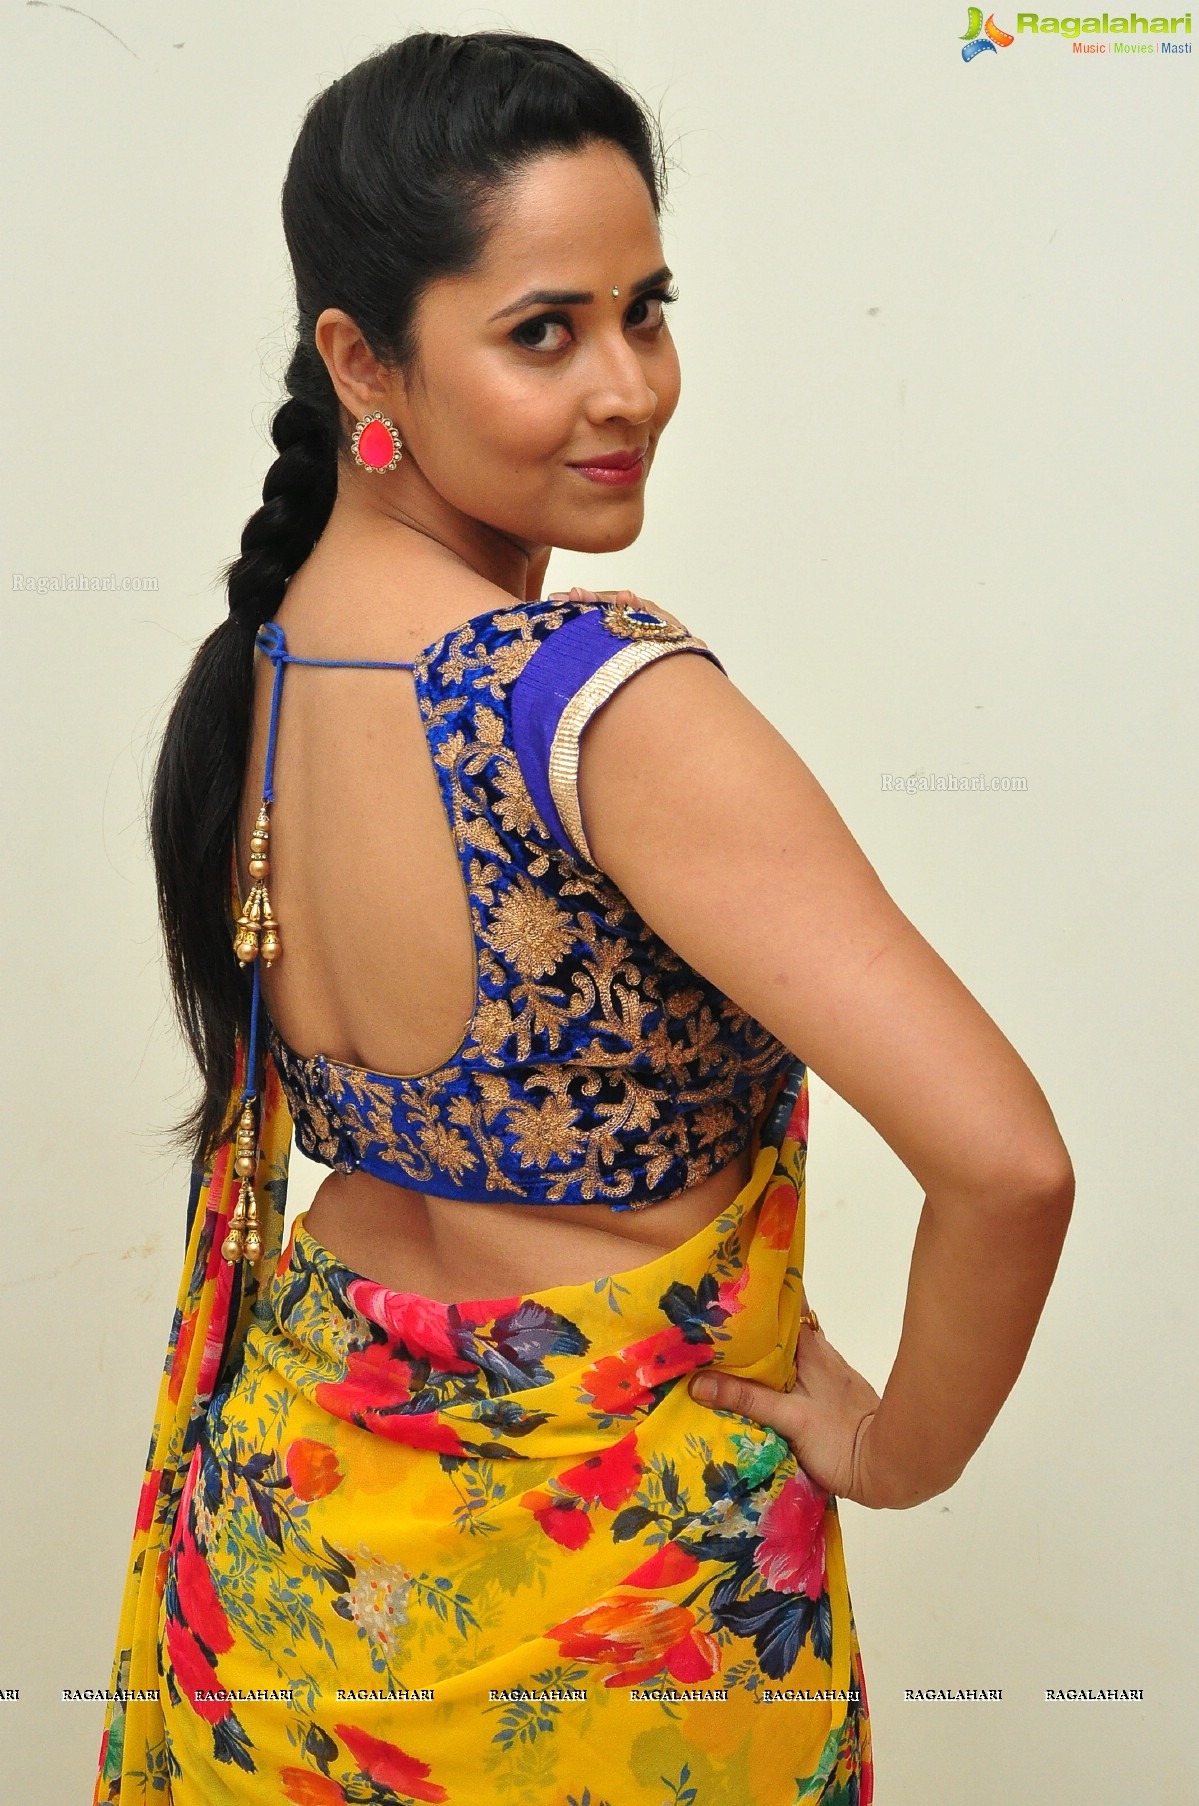 Anasuya Image 8 Telugu Heroines Postersimages Photos Pictures